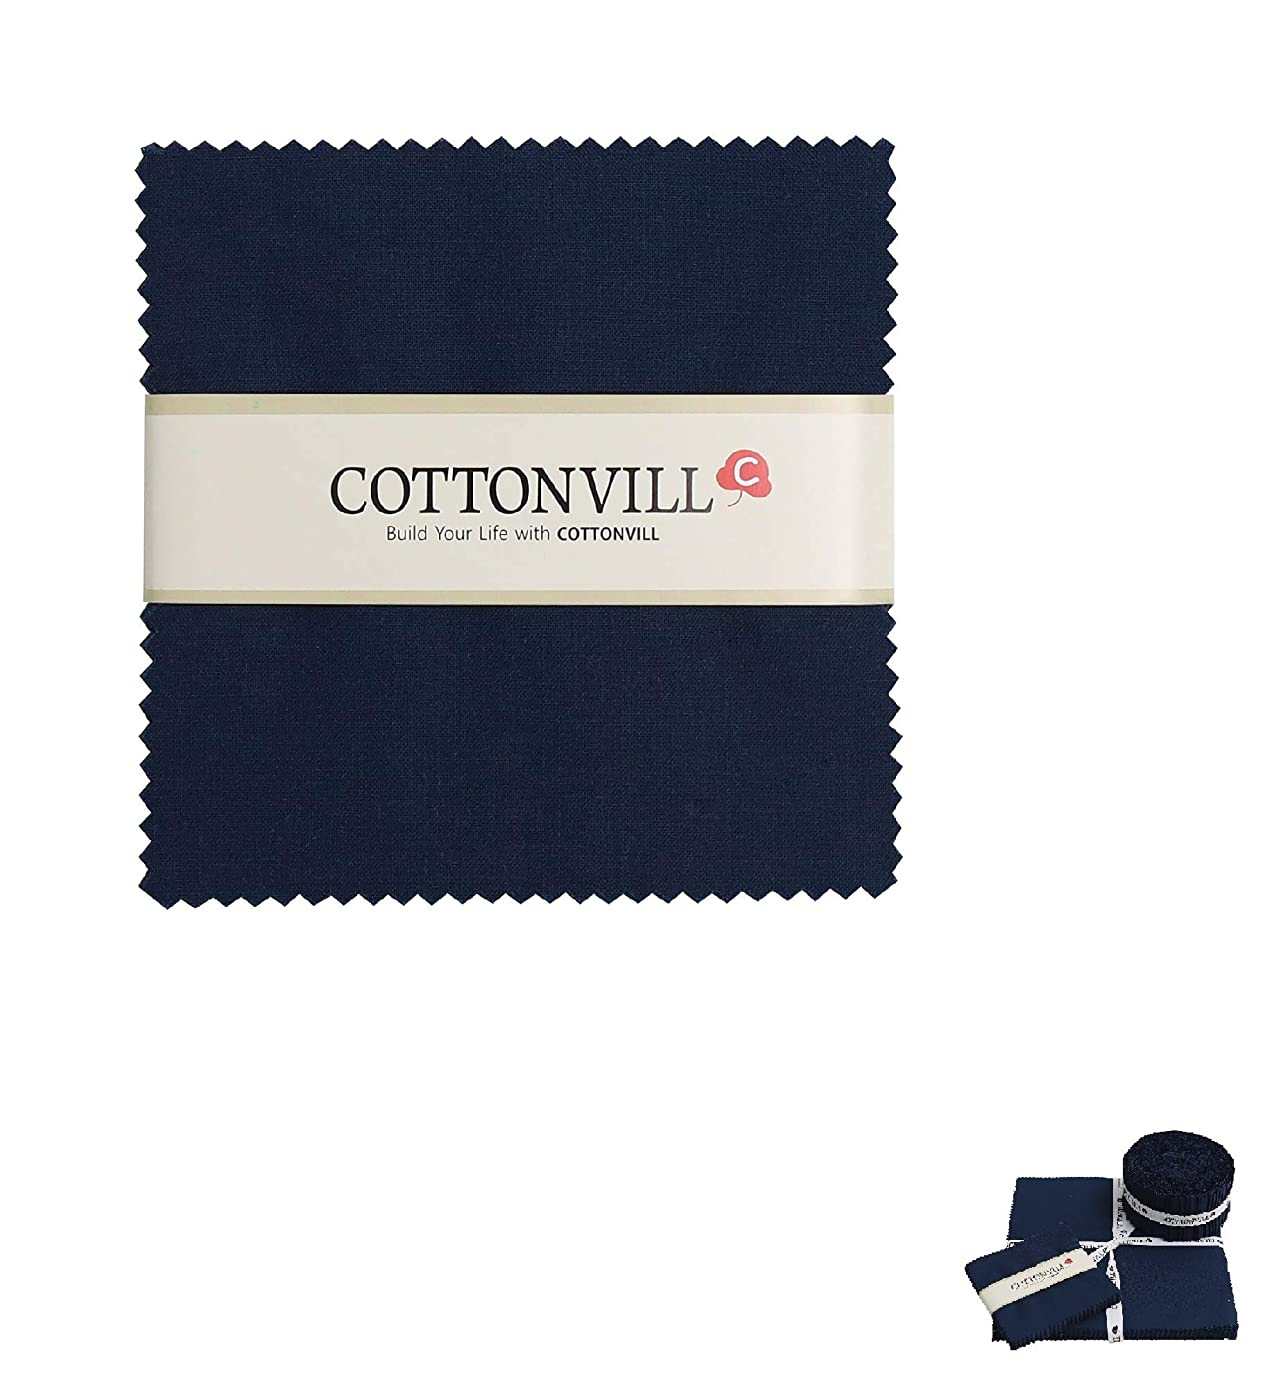 COTTONVILL Cotton Solid Precut Quilting Fabric Bundle 42 pcs, Navy (5